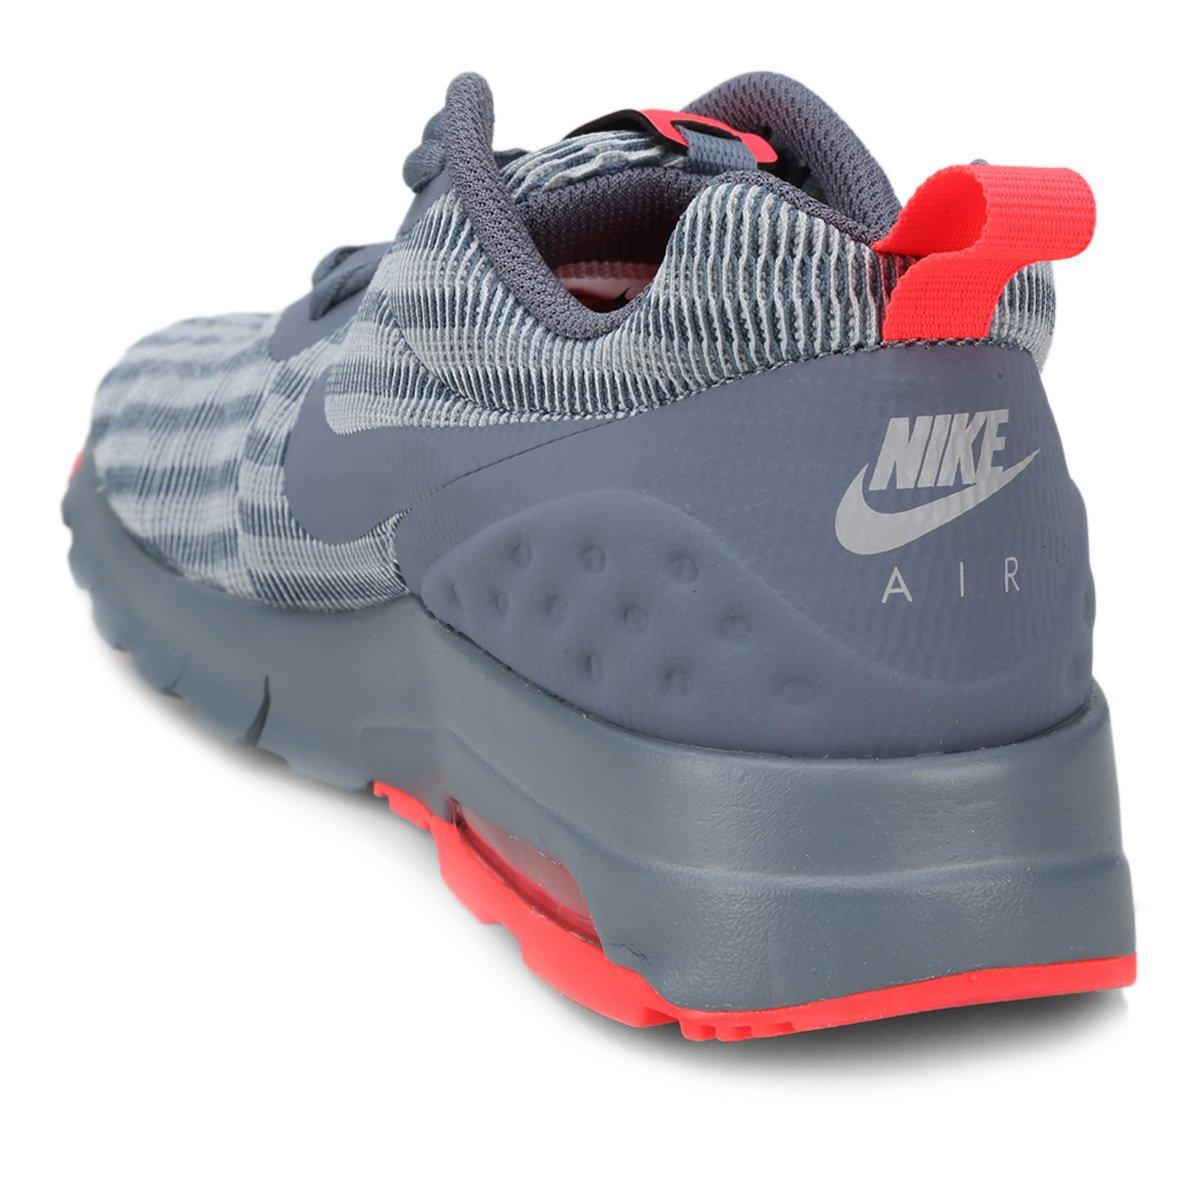 6577bc87dea Tênis Nike Air Max Motion Lw Se Feminino .